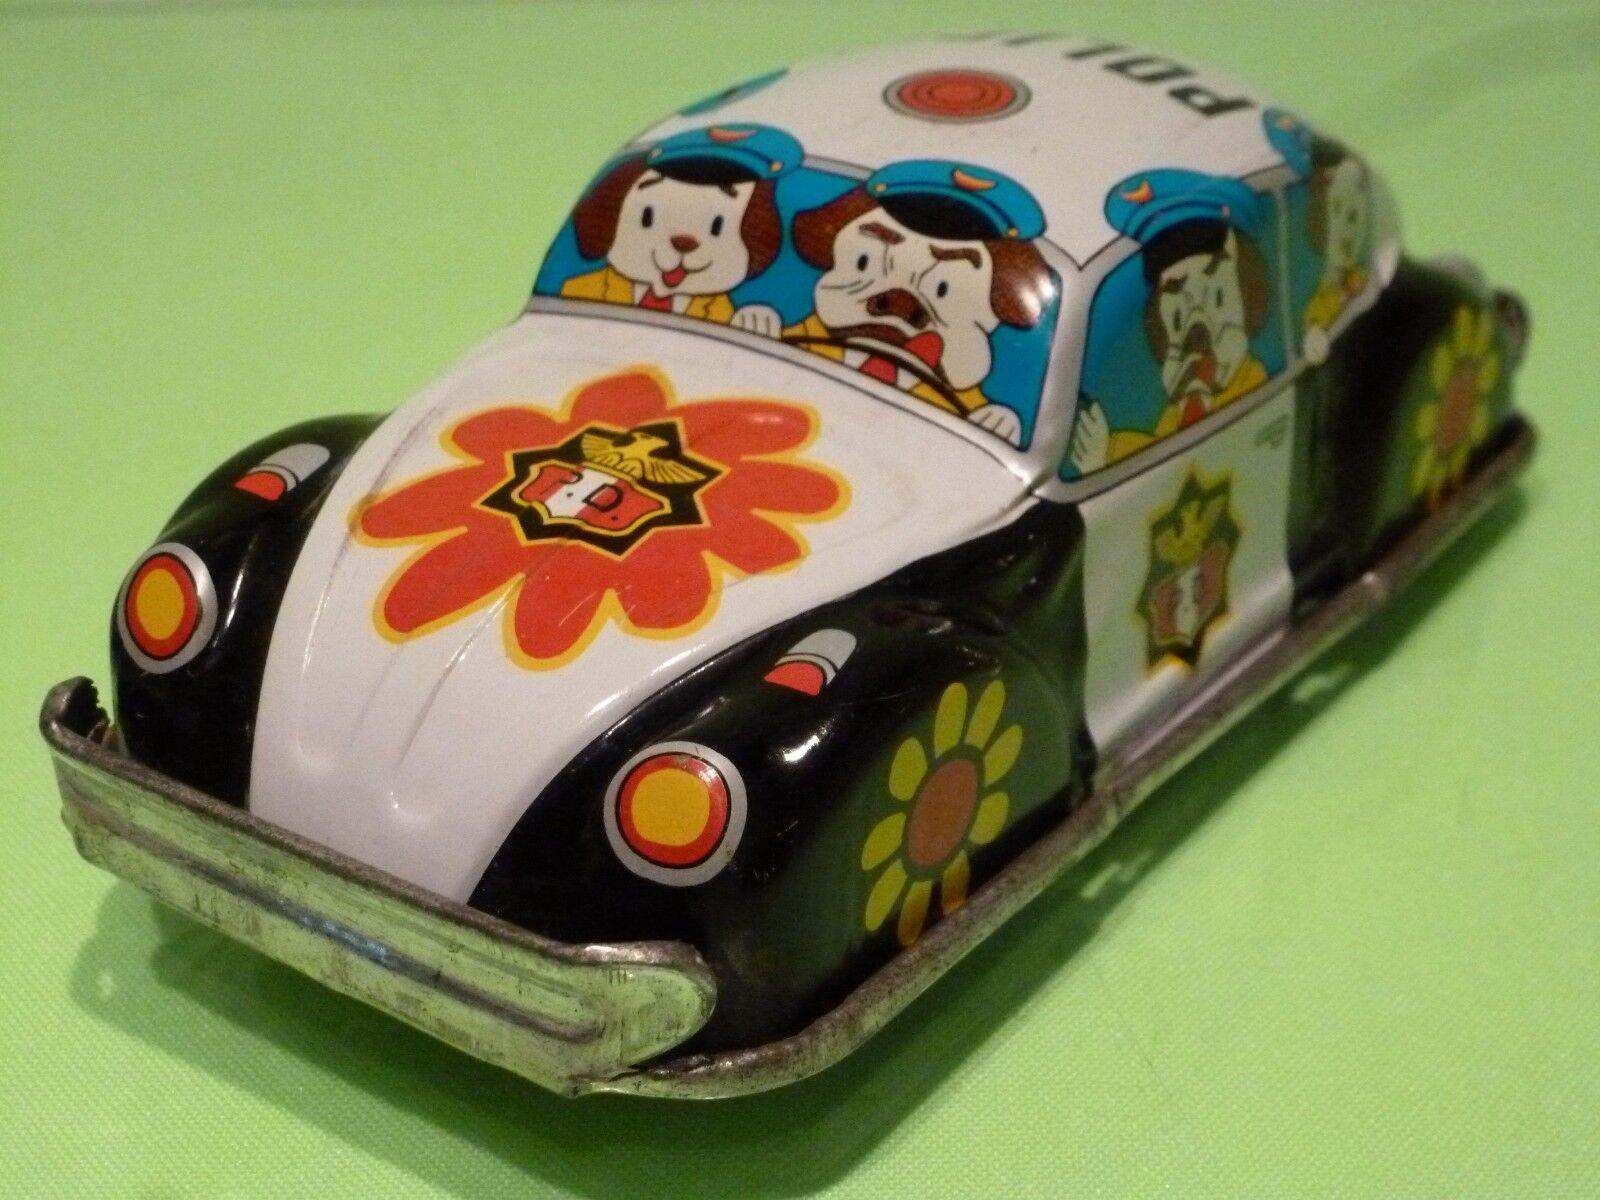 VINTAGE TIN TOY BLECH JAPAN K TOY - VW BEETLE CARTOON WILD WOODY - POLICE - RARE